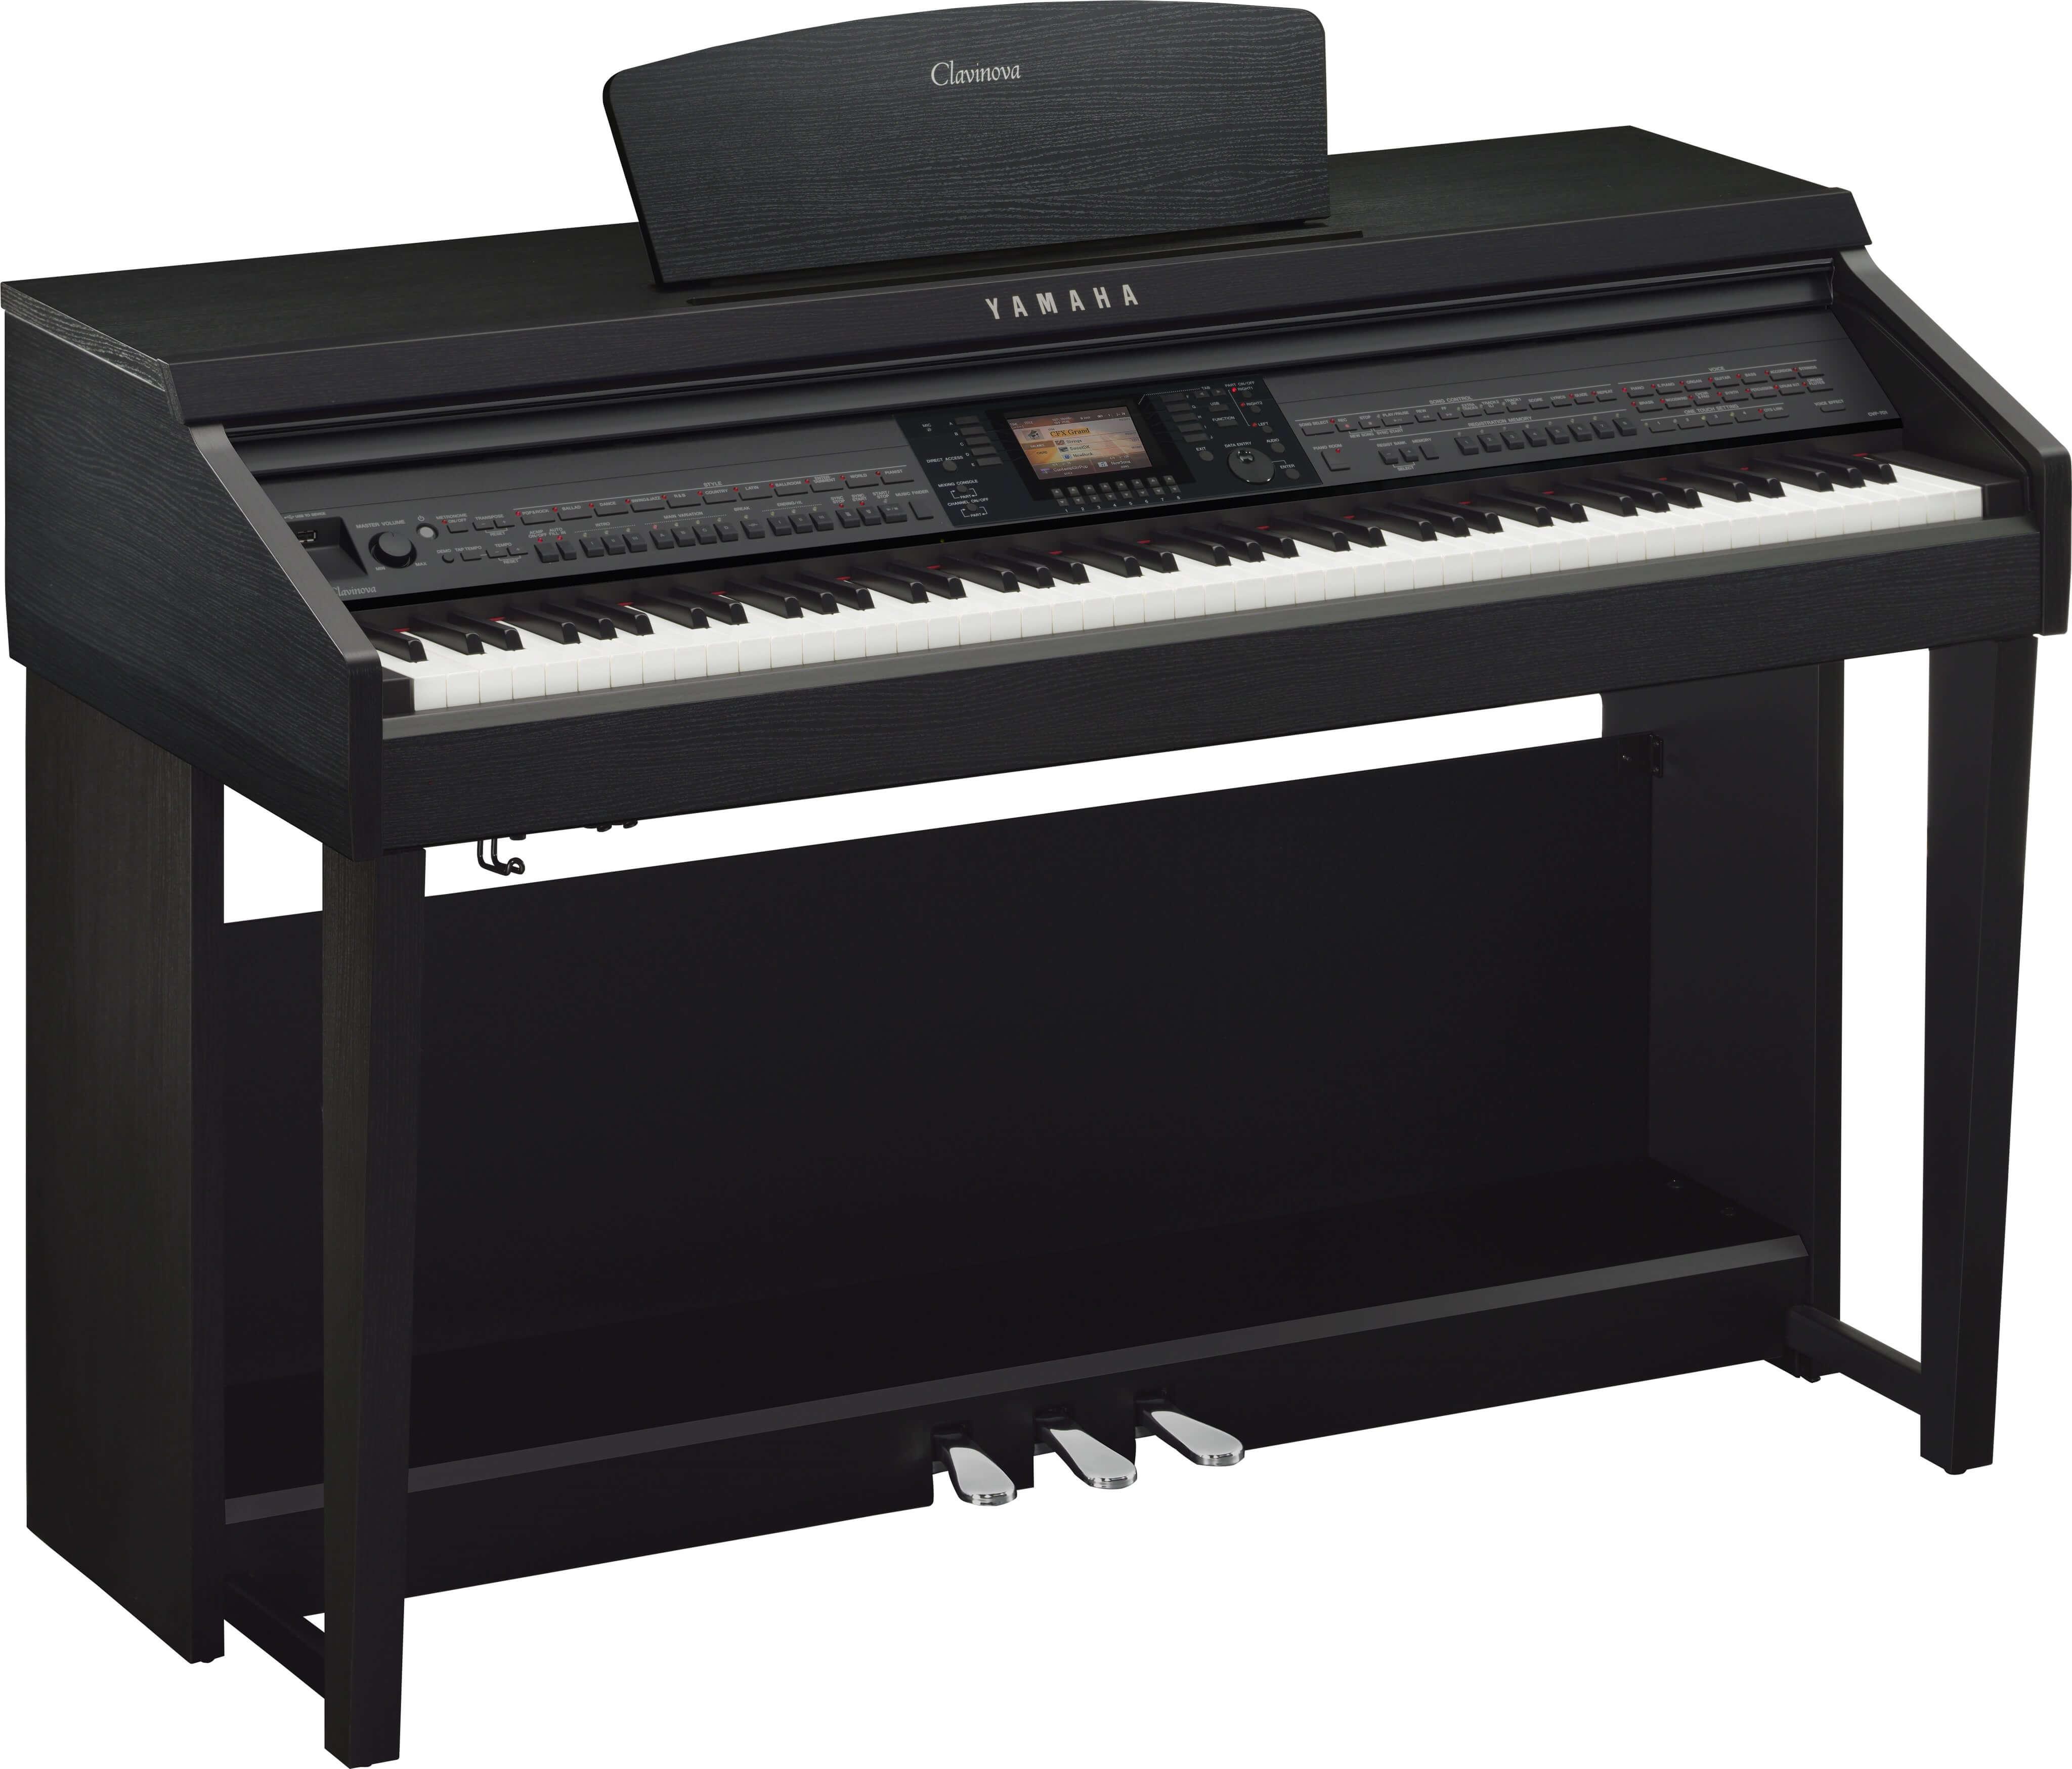 Pack Piano Digital Yamaha CVP-701B